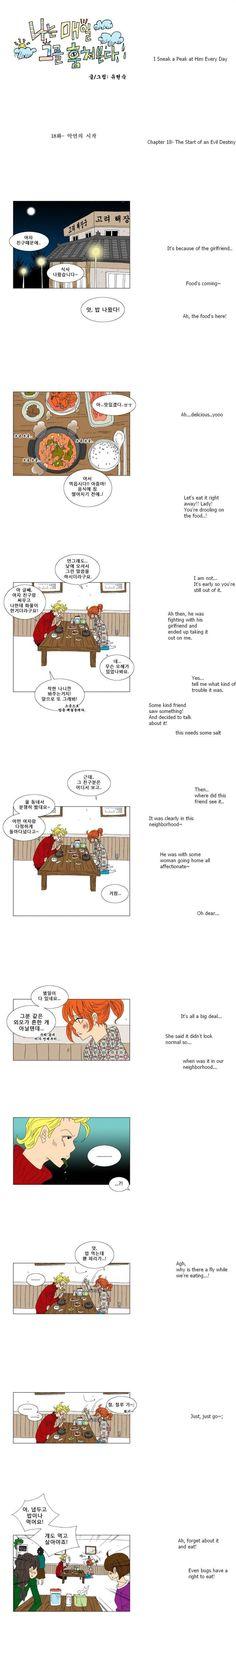 [Webtoon] I Sneak A Peak At Him Every Day 18 @ HanCinema :: The Korean Movie and Drama Database